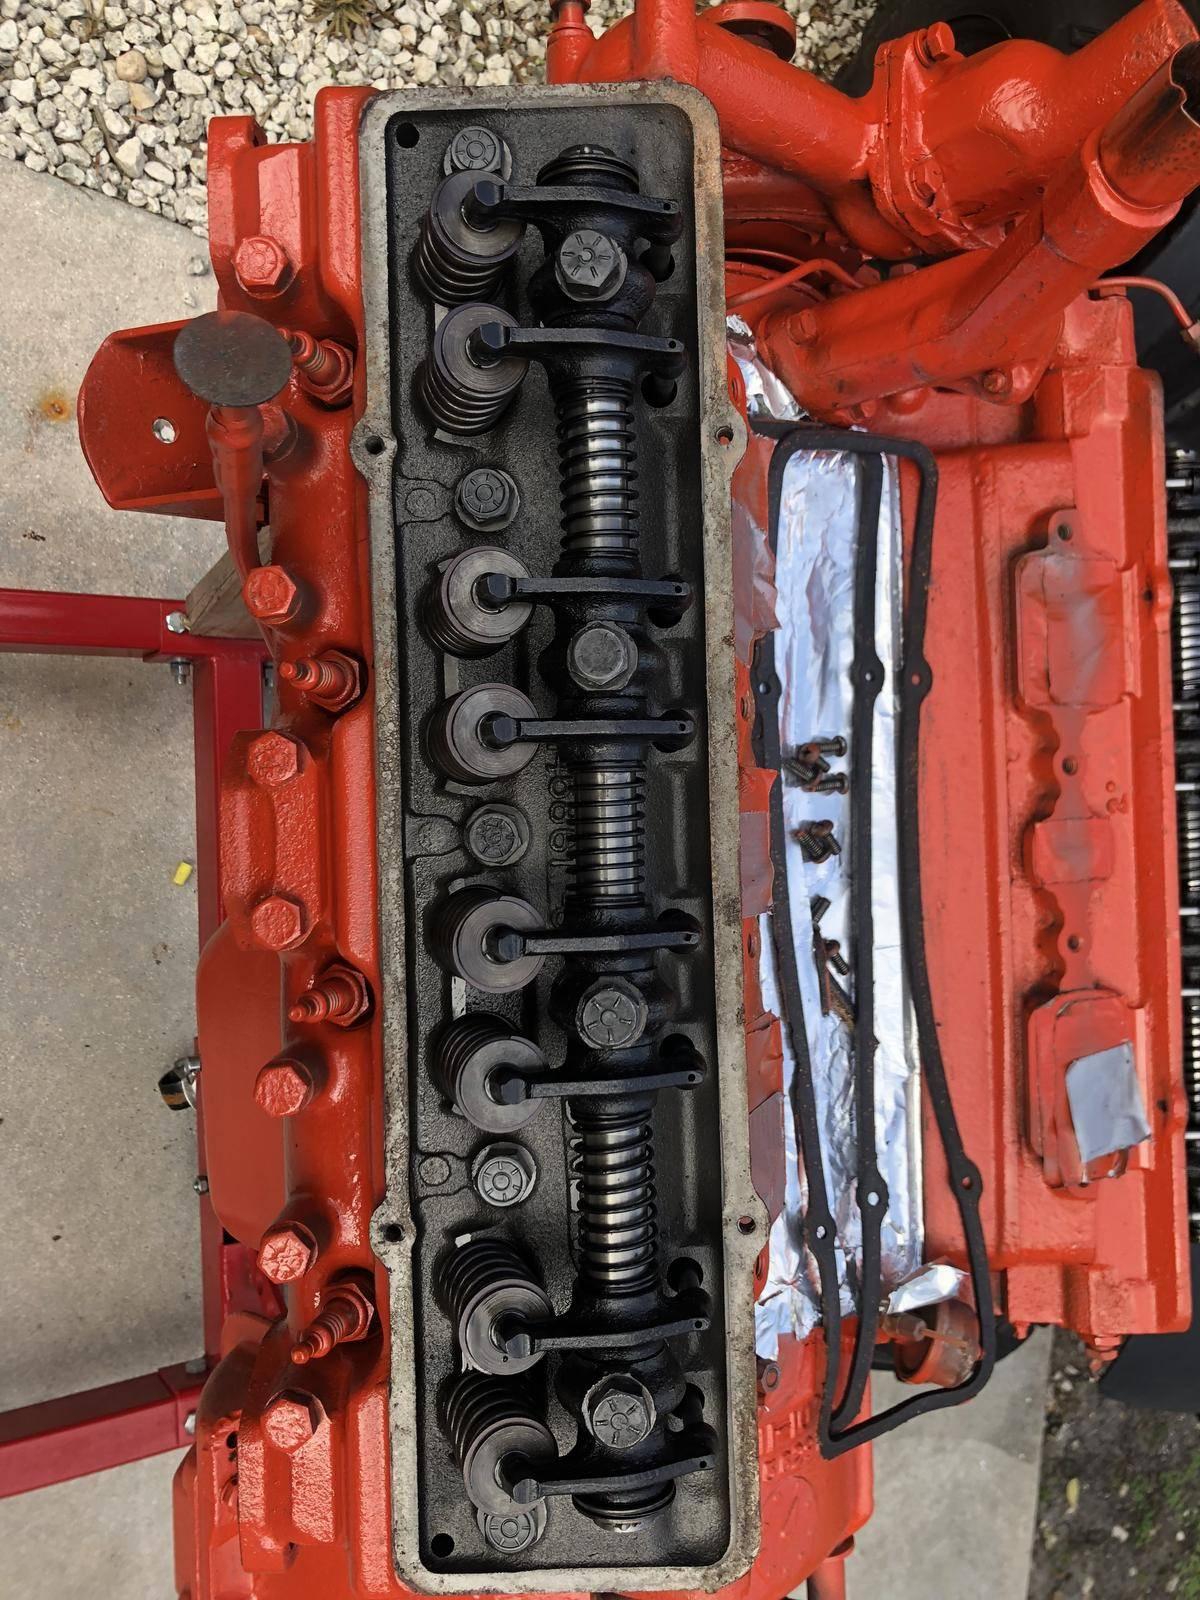 image 1 of 9 1952 cadillac 331 engine [ 1200 x 1600 Pixel ]